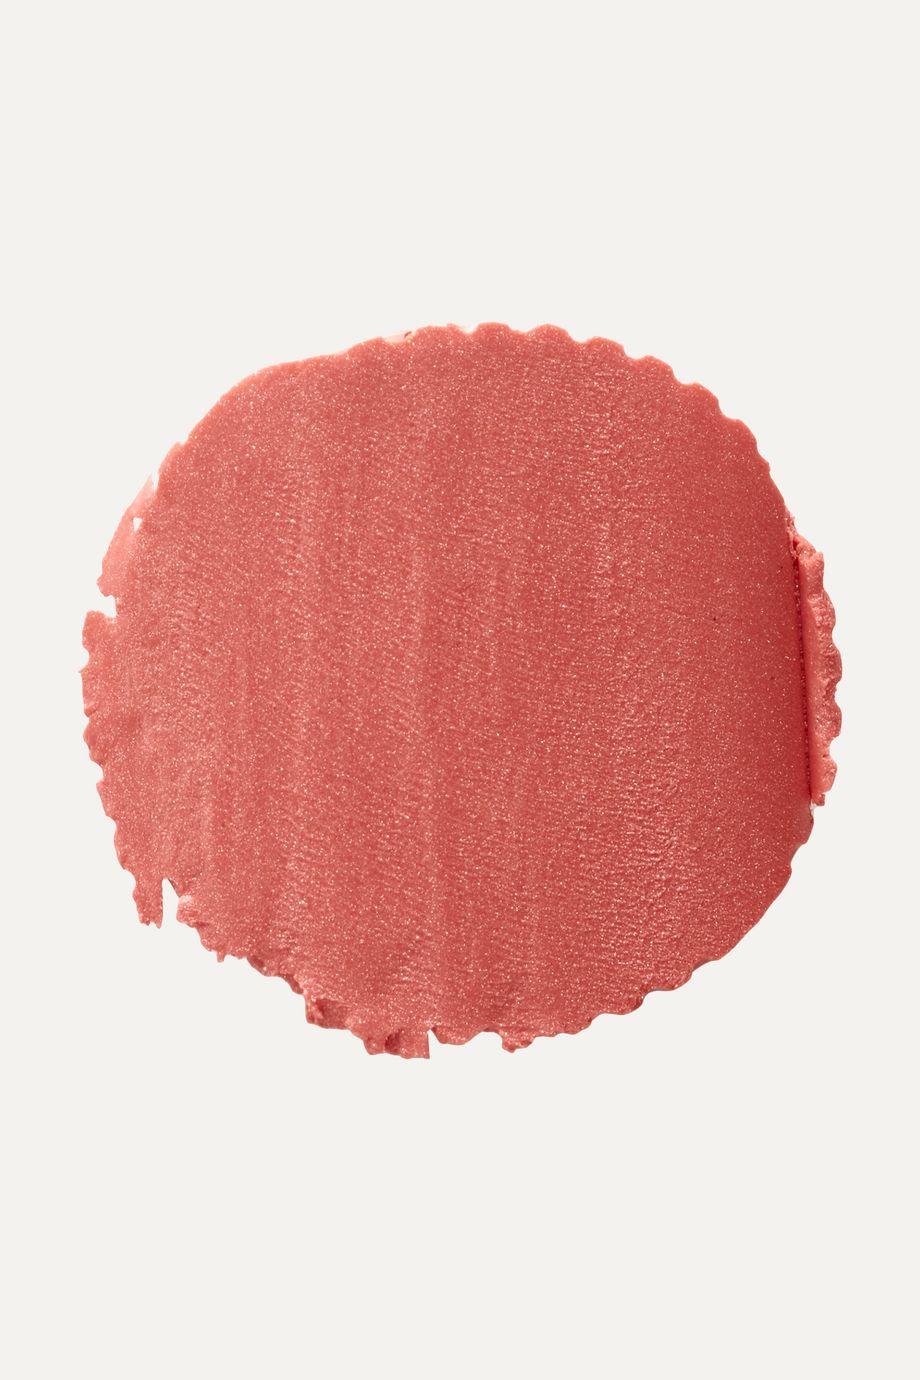 Burberry Beauty Full Kisses - Nude Blush No.501